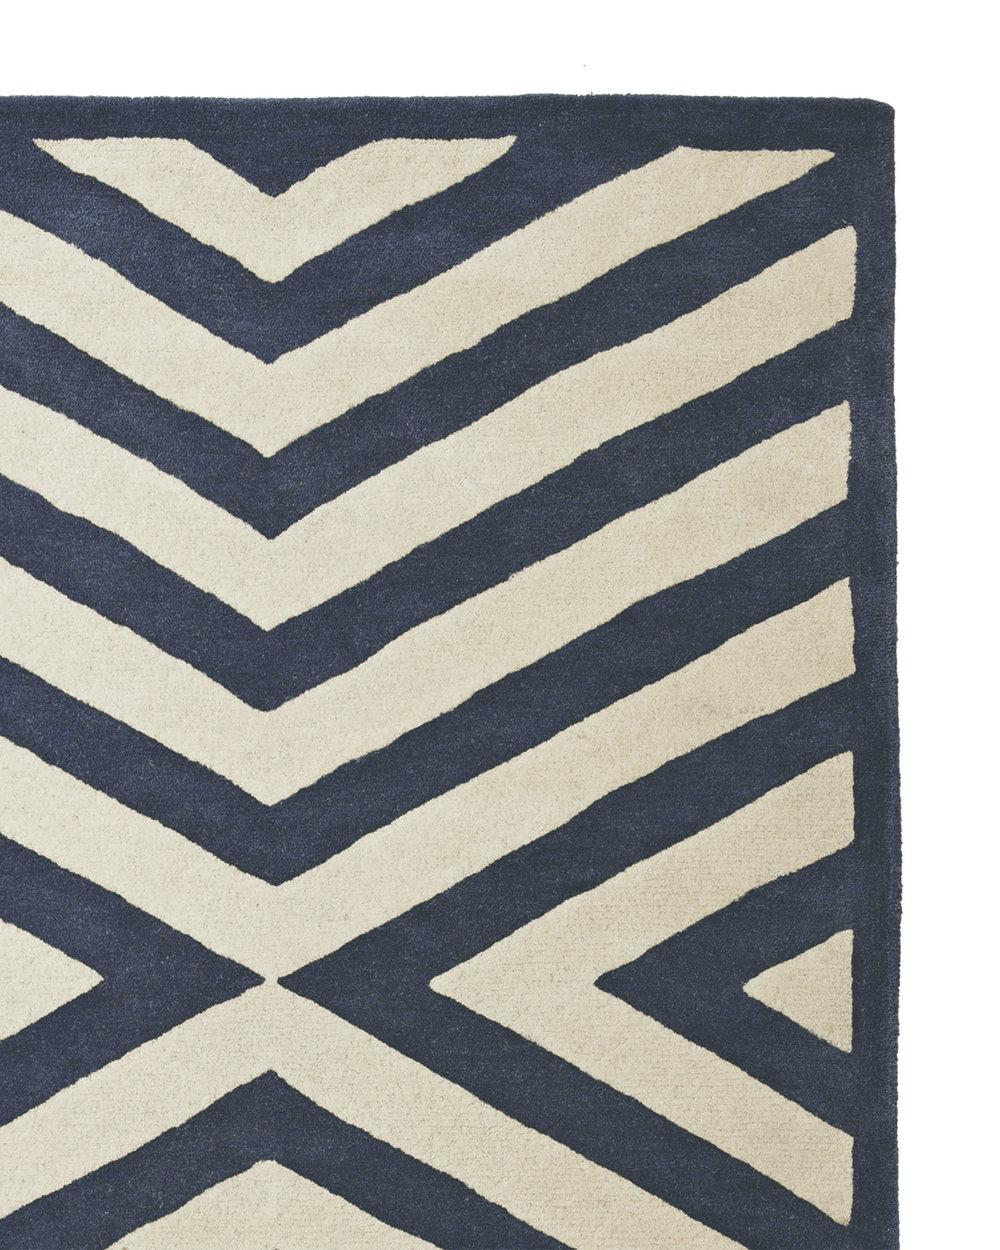 Indigo modern area rug